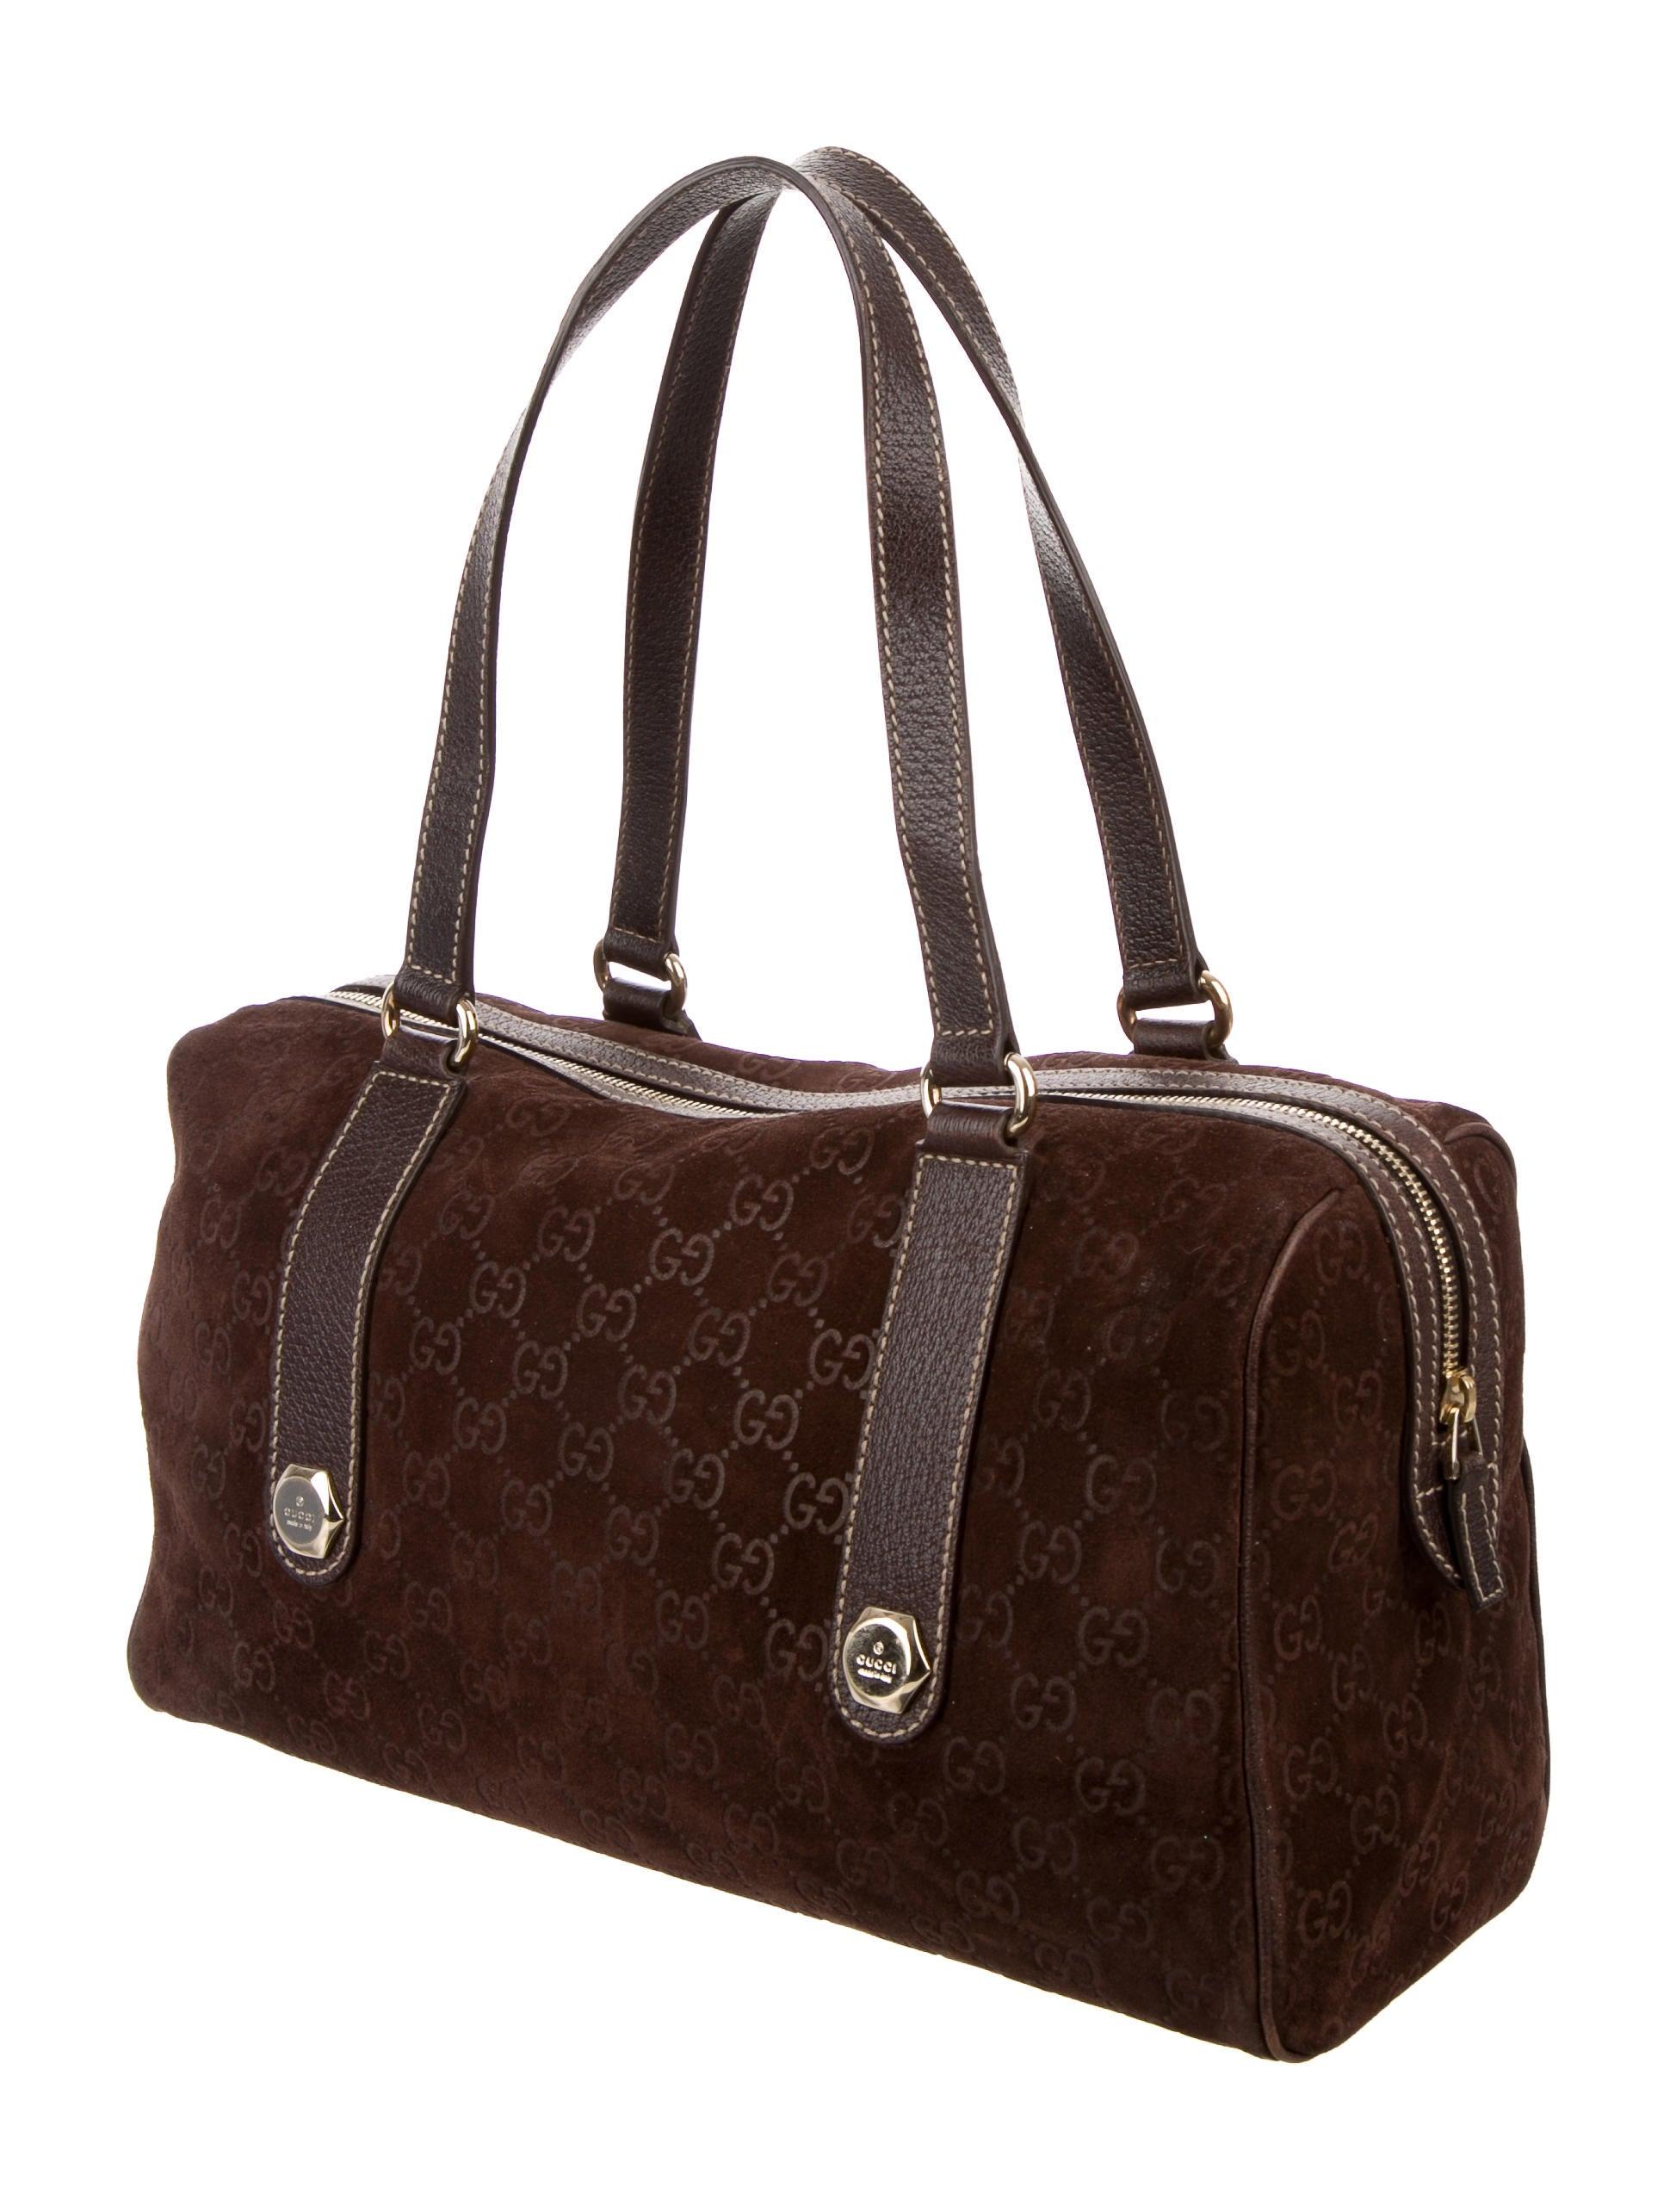 Boston Bag Patchwork Tutorial: Gucci GG Suede Large Boston Bag